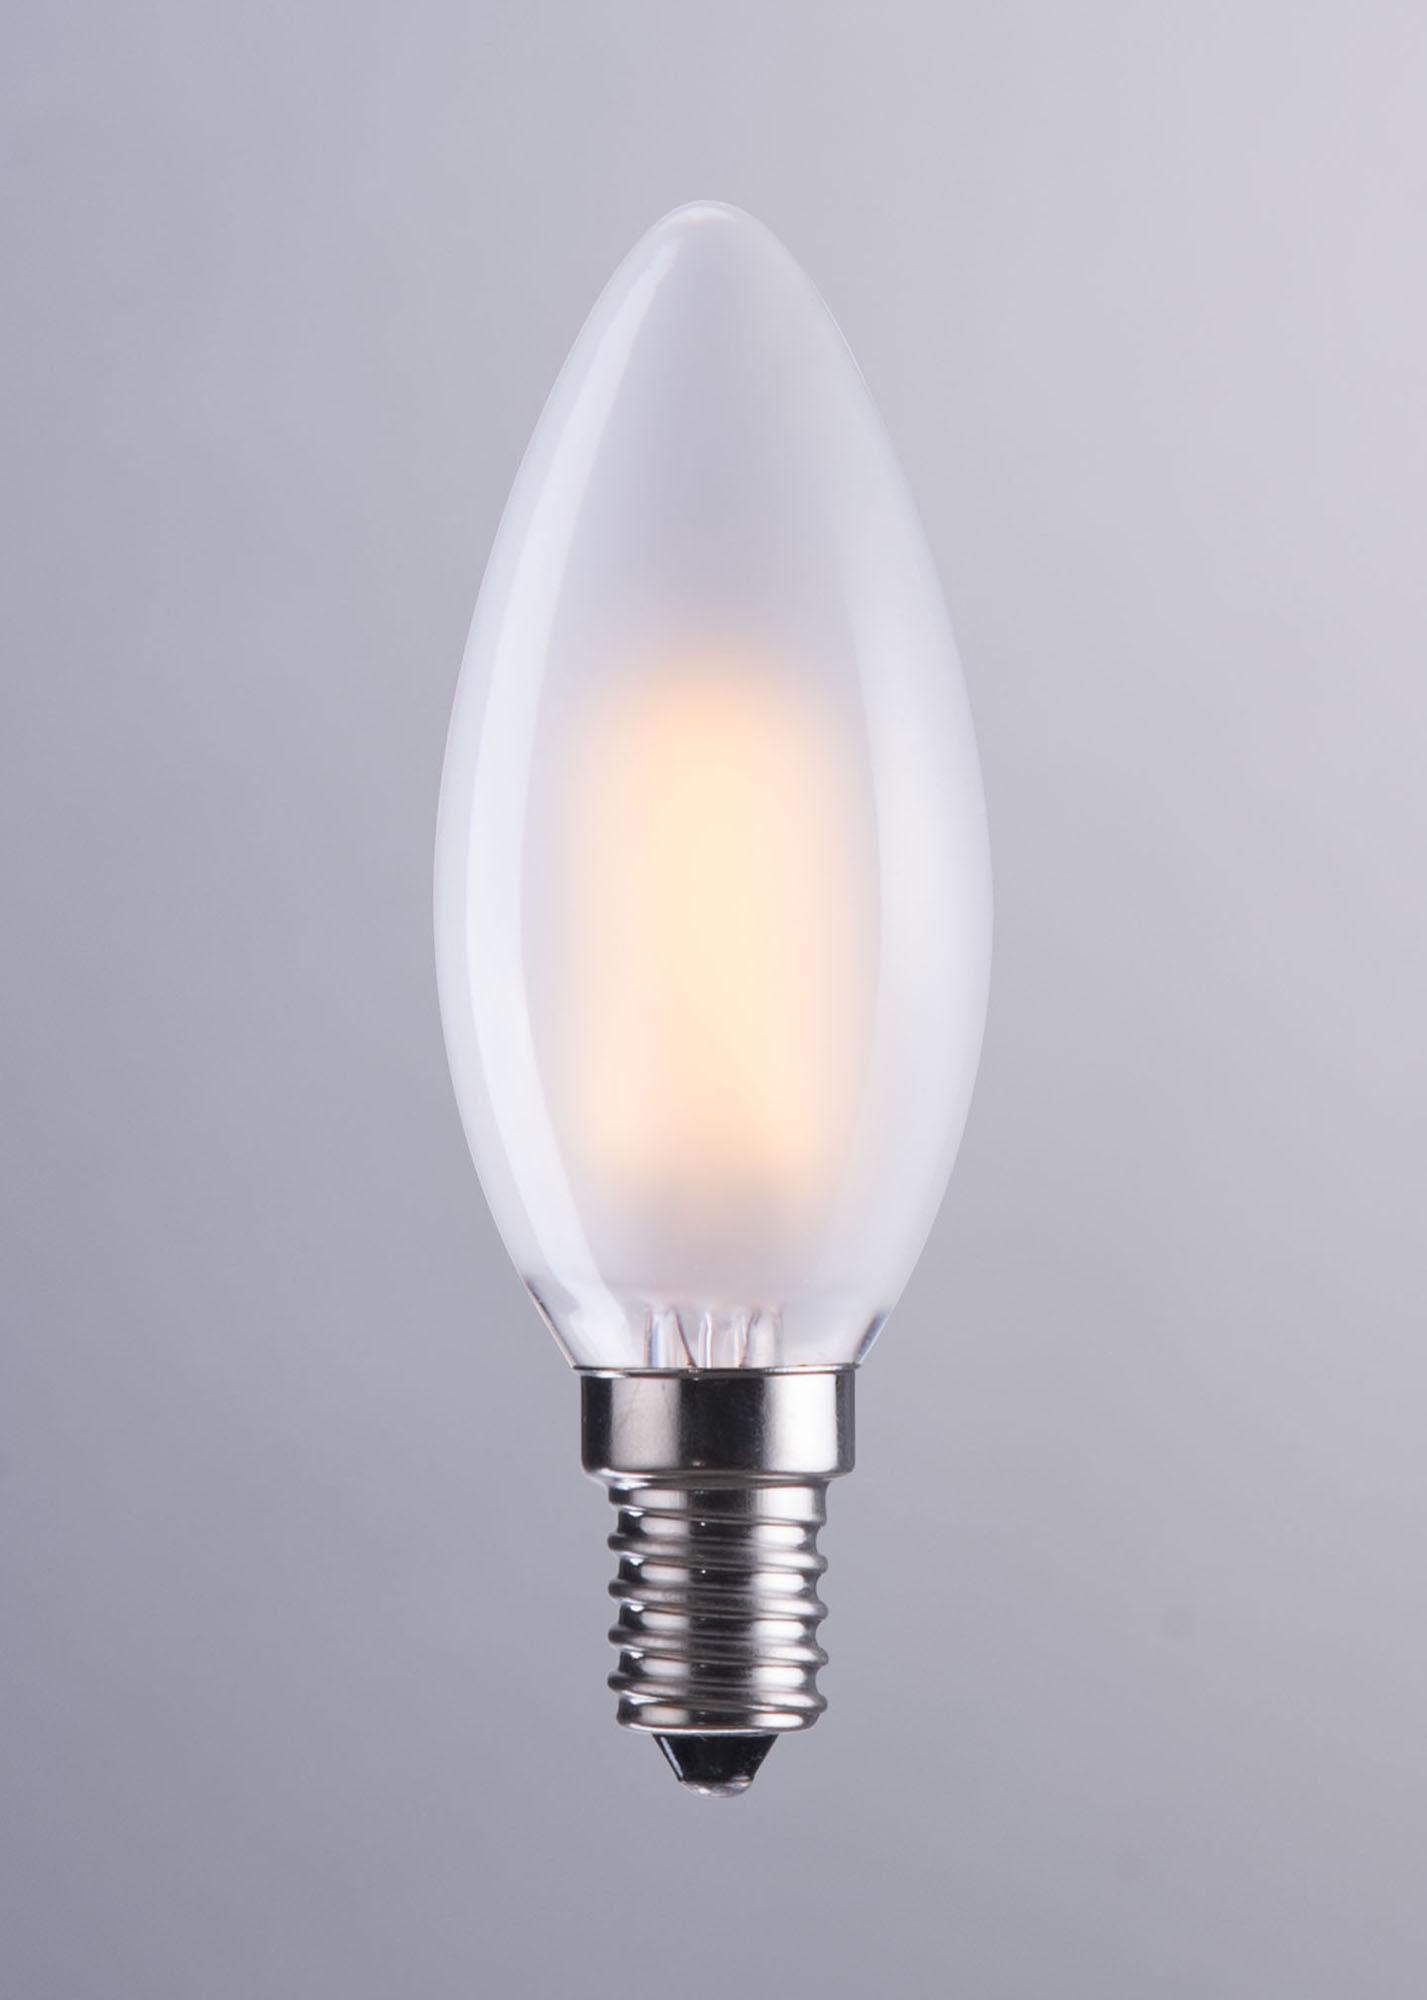 E12 Type B 4w Led 98x35mm F White Light Bulb By Zuo